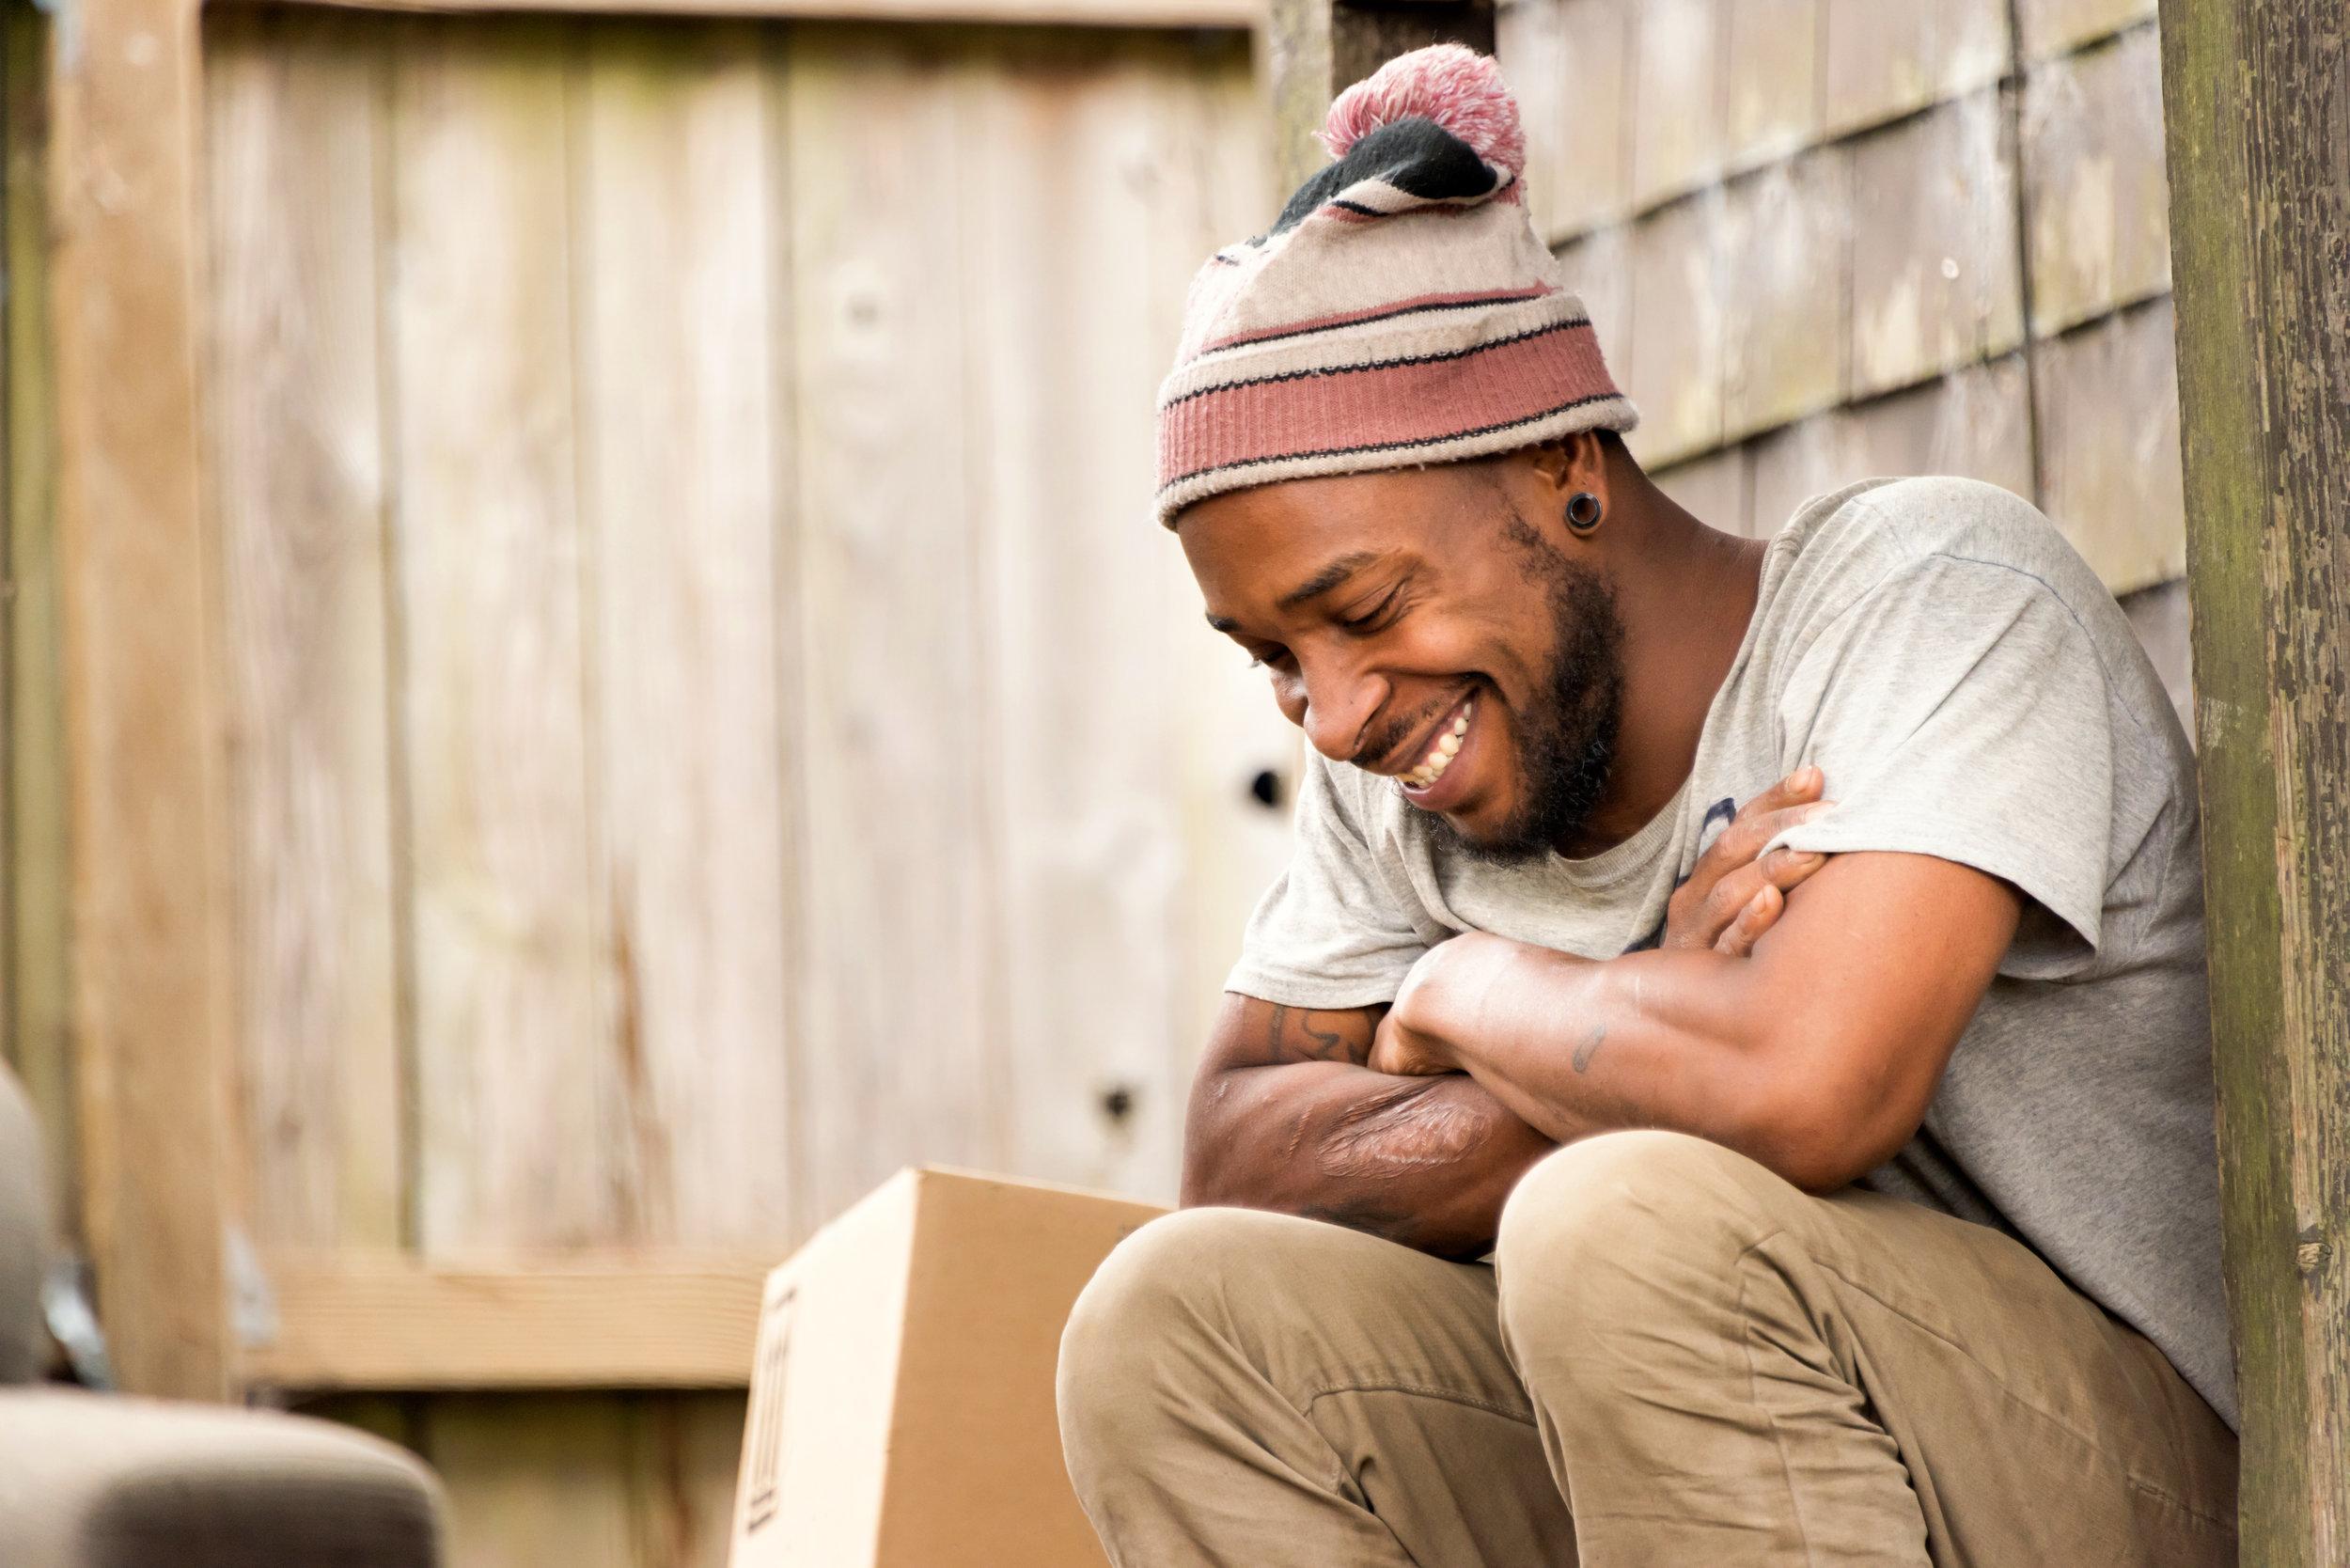 Smiling-afro-caribbean-young-man-811600580_7360x4912.jpeg